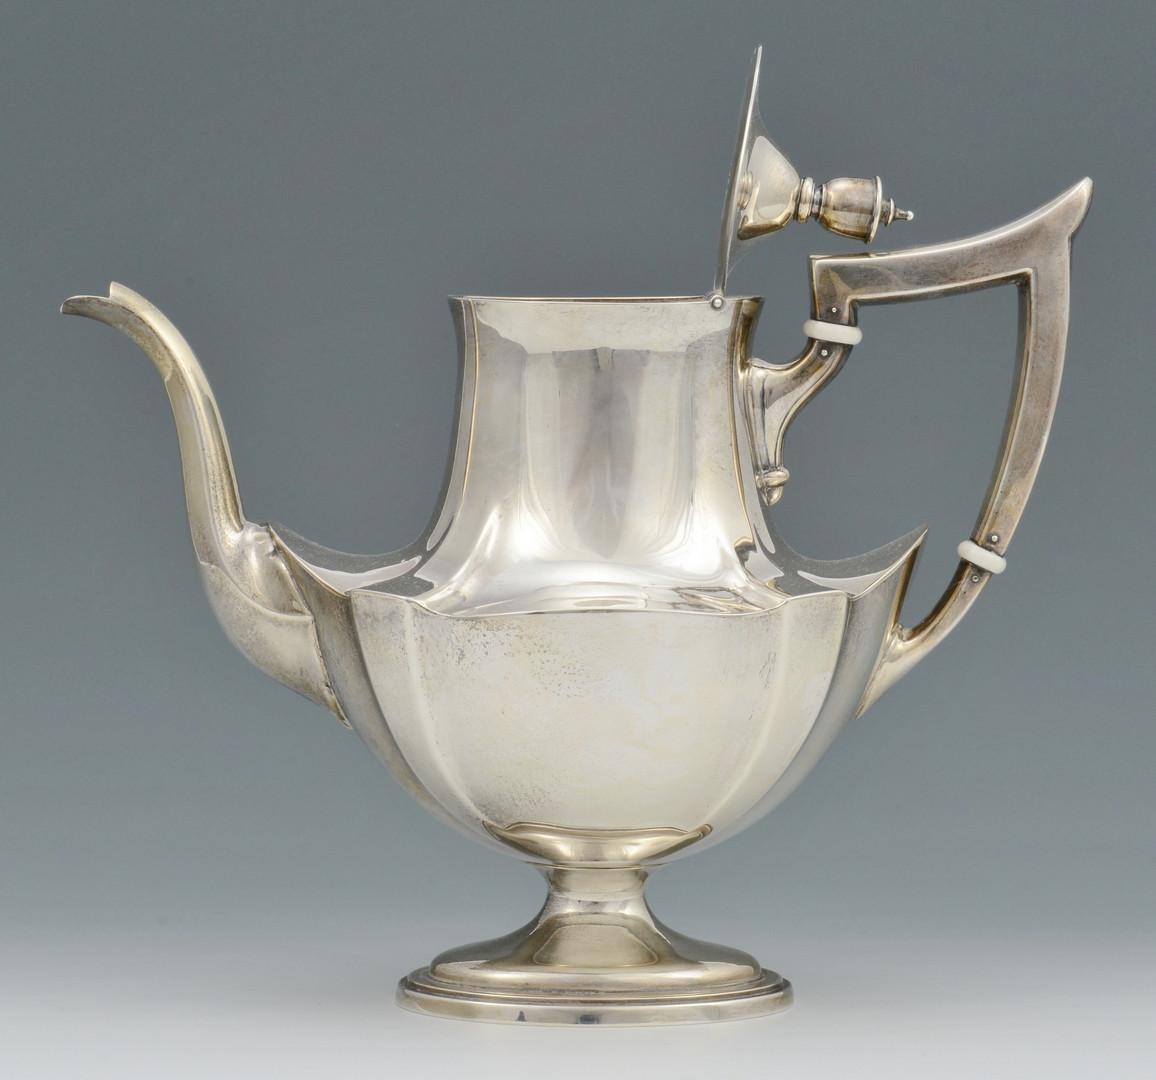 Lot 685: 4 pc. Gorham Tea Service, Plymouth Pattern